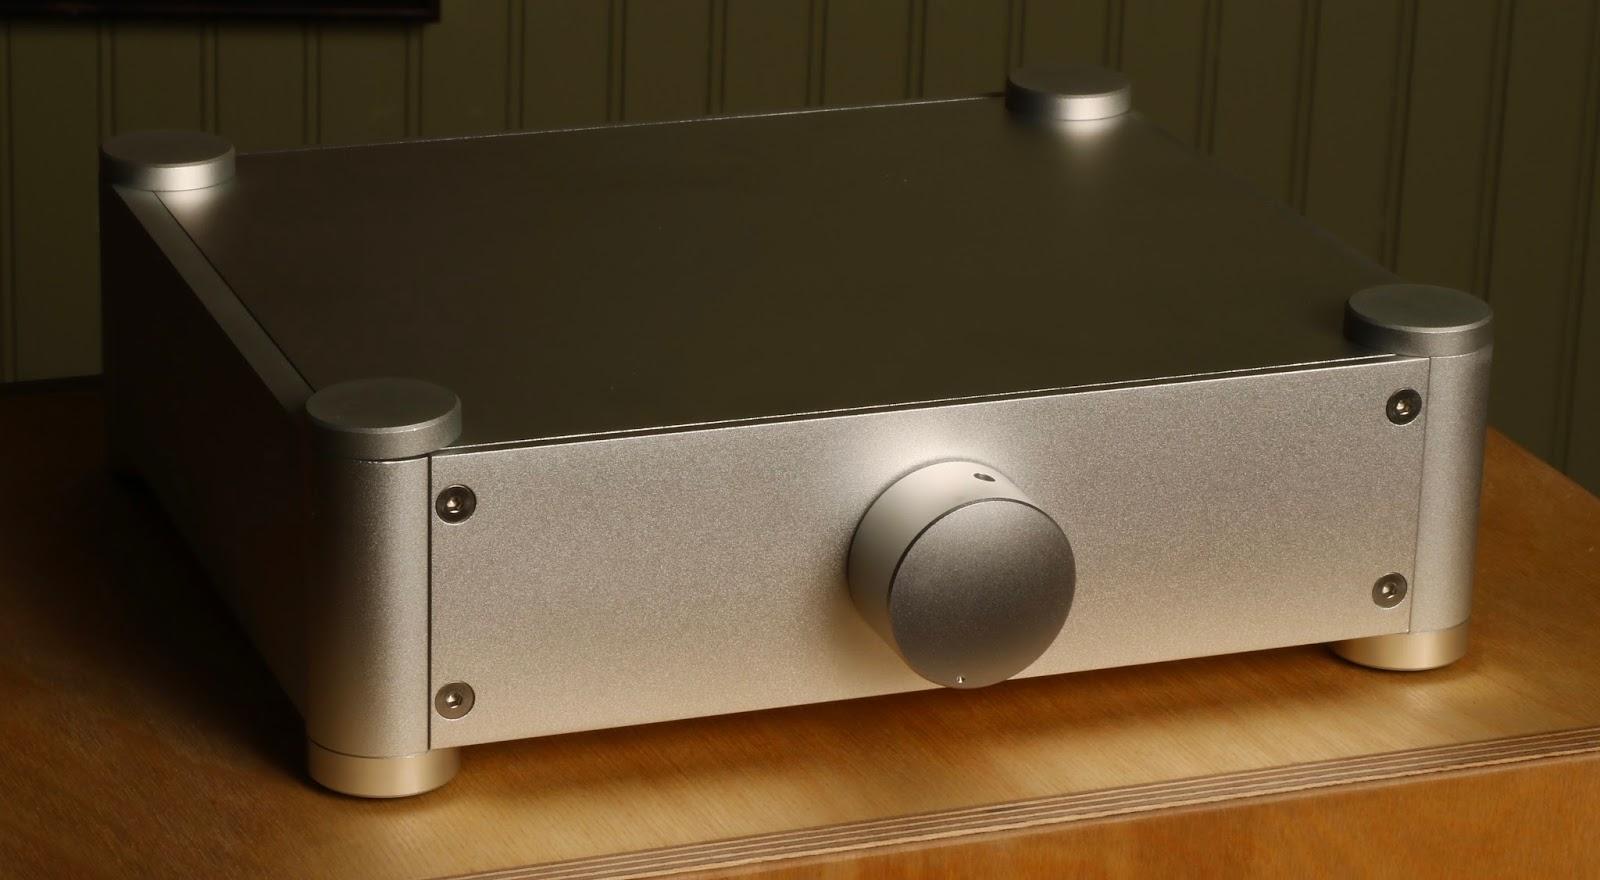 Fleawatt Class D Amplifier Circuit Tpa3116d2 Tpa3118d2 Subwoofer Ravel Ii Sold To Joon K Of Middle Village Ny